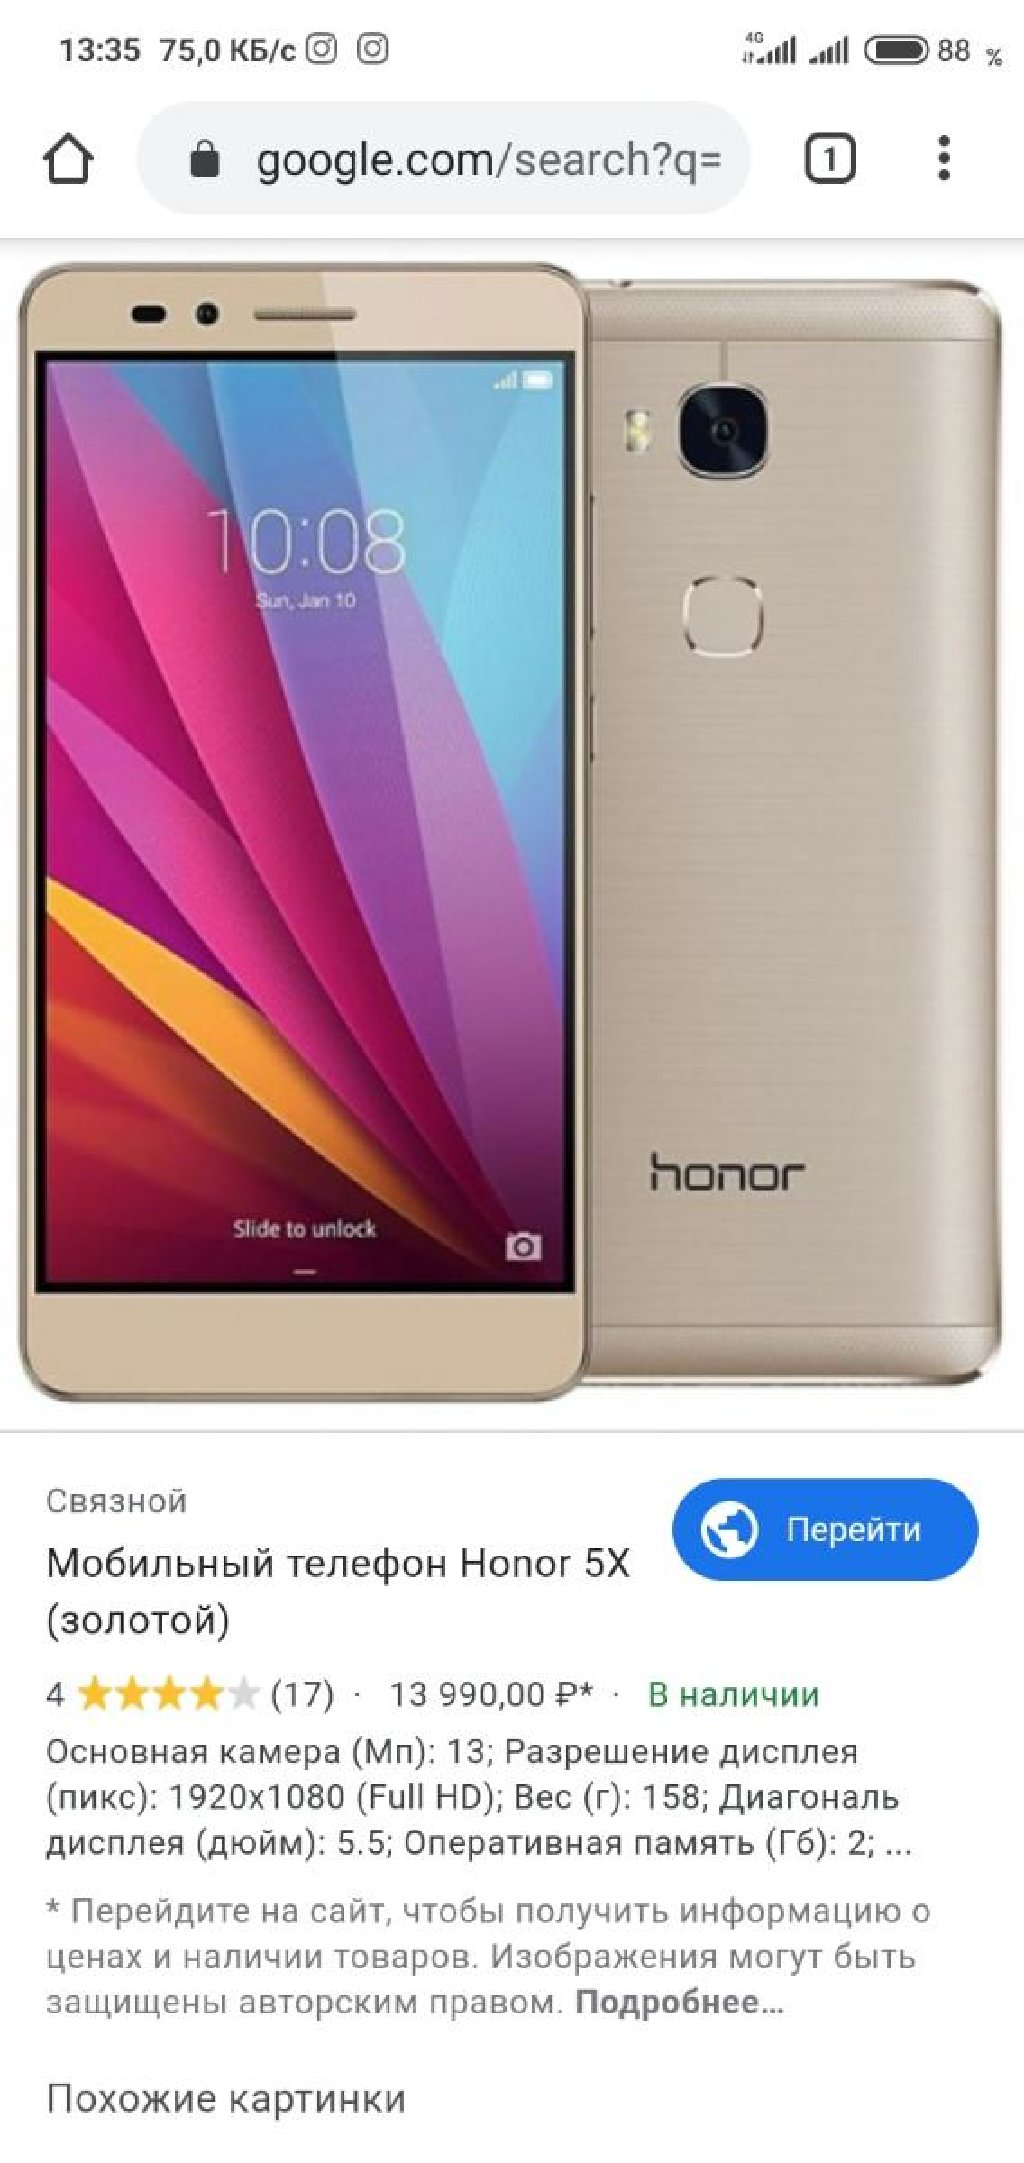 Honor 5x состояние норм 3GB оперативка память 16GB торг уместен!